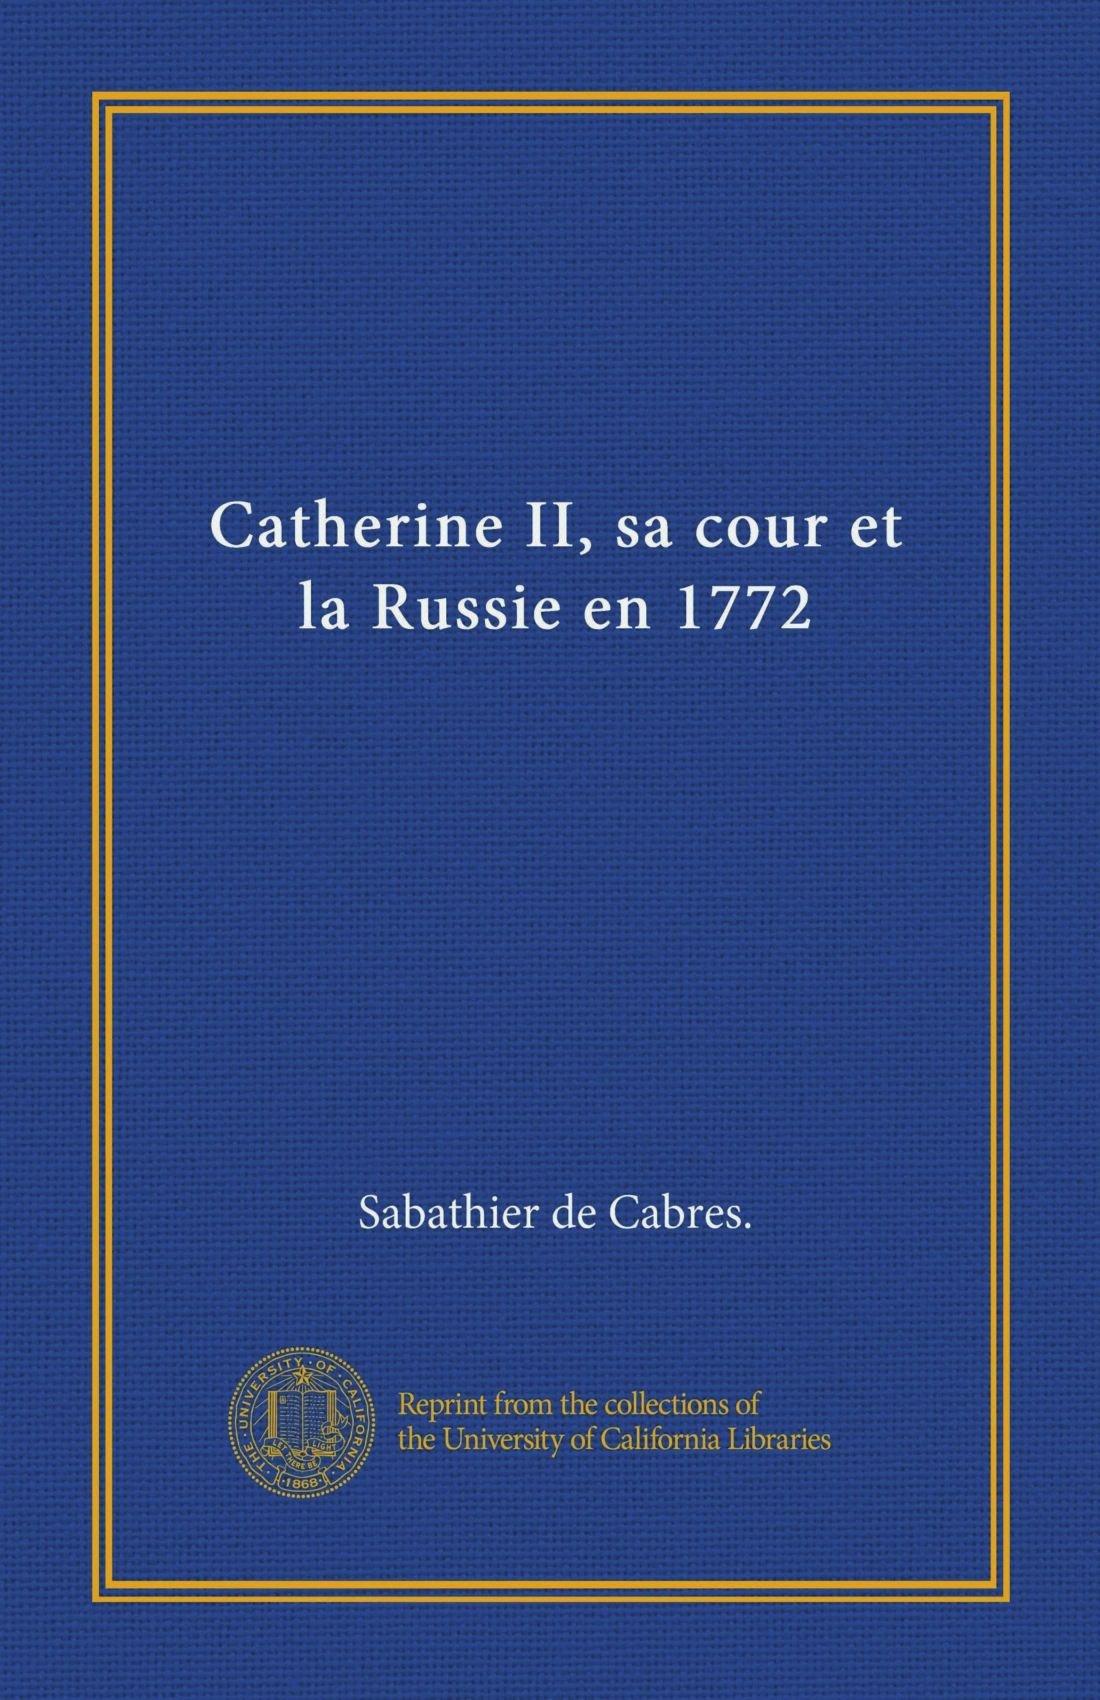 Download Catherine II, sa cour et la Russie en 1772 (French Edition) pdf